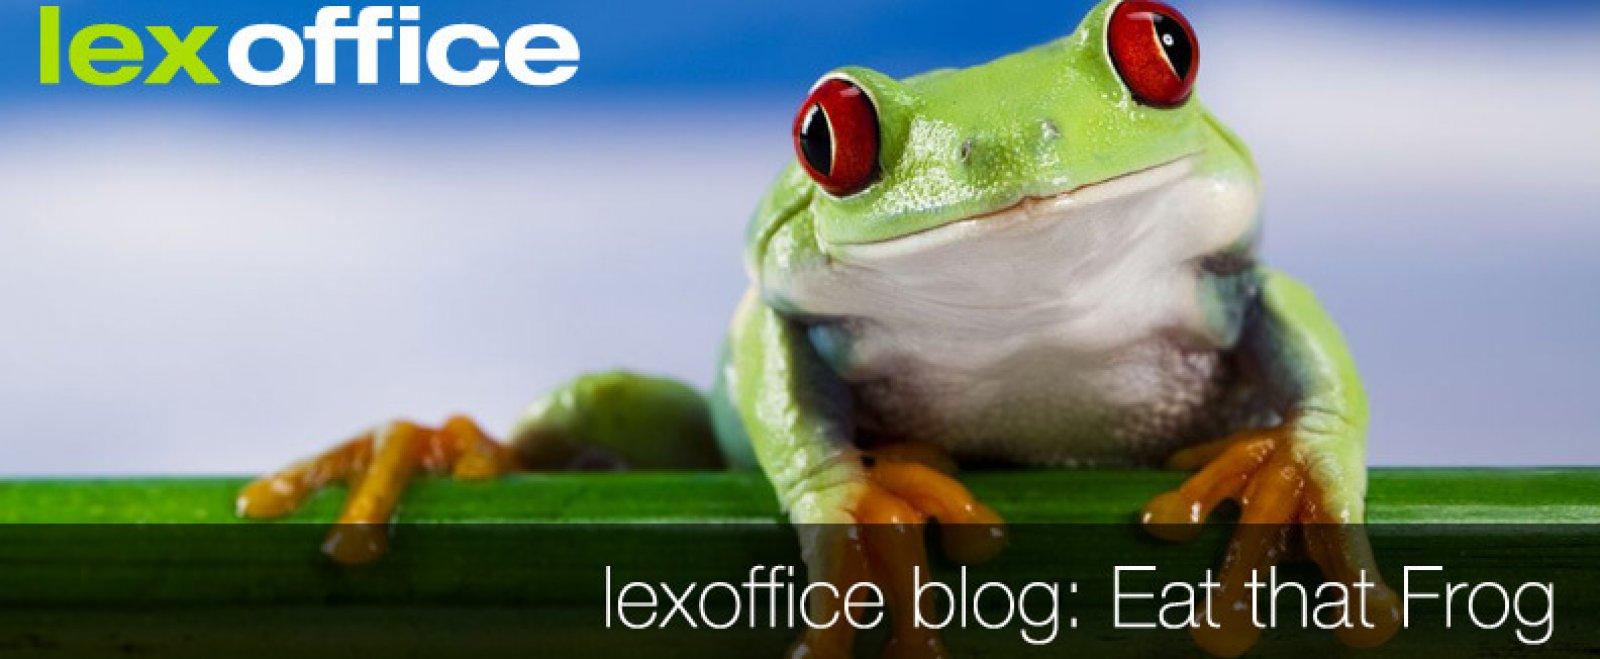 Work-Life-Balance: Eat that frog